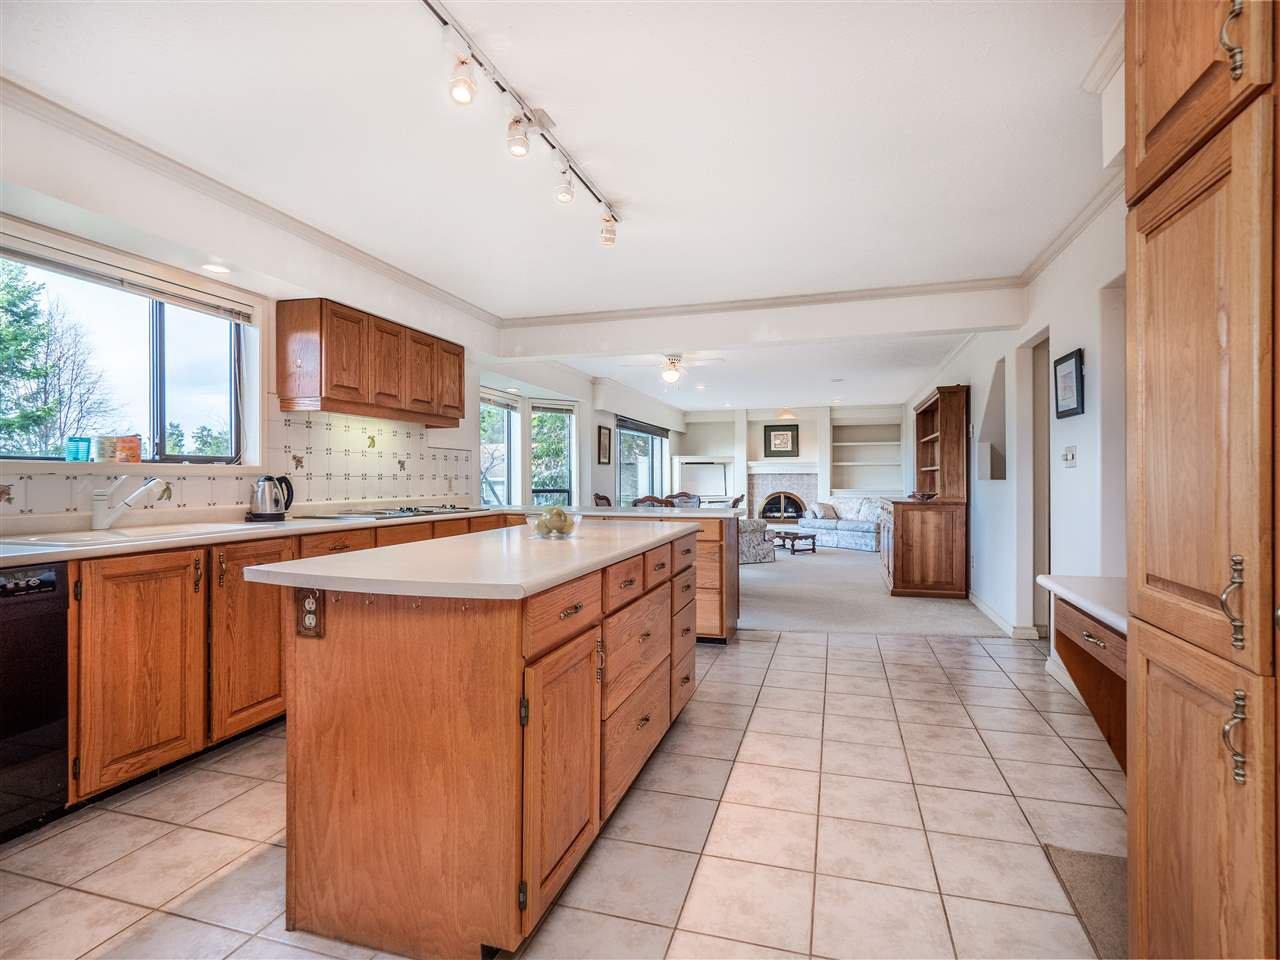 Photo 4: Photos: 5107 RADCLIFFE Road in Sechelt: Sechelt District House for sale (Sunshine Coast)  : MLS®# R2425277